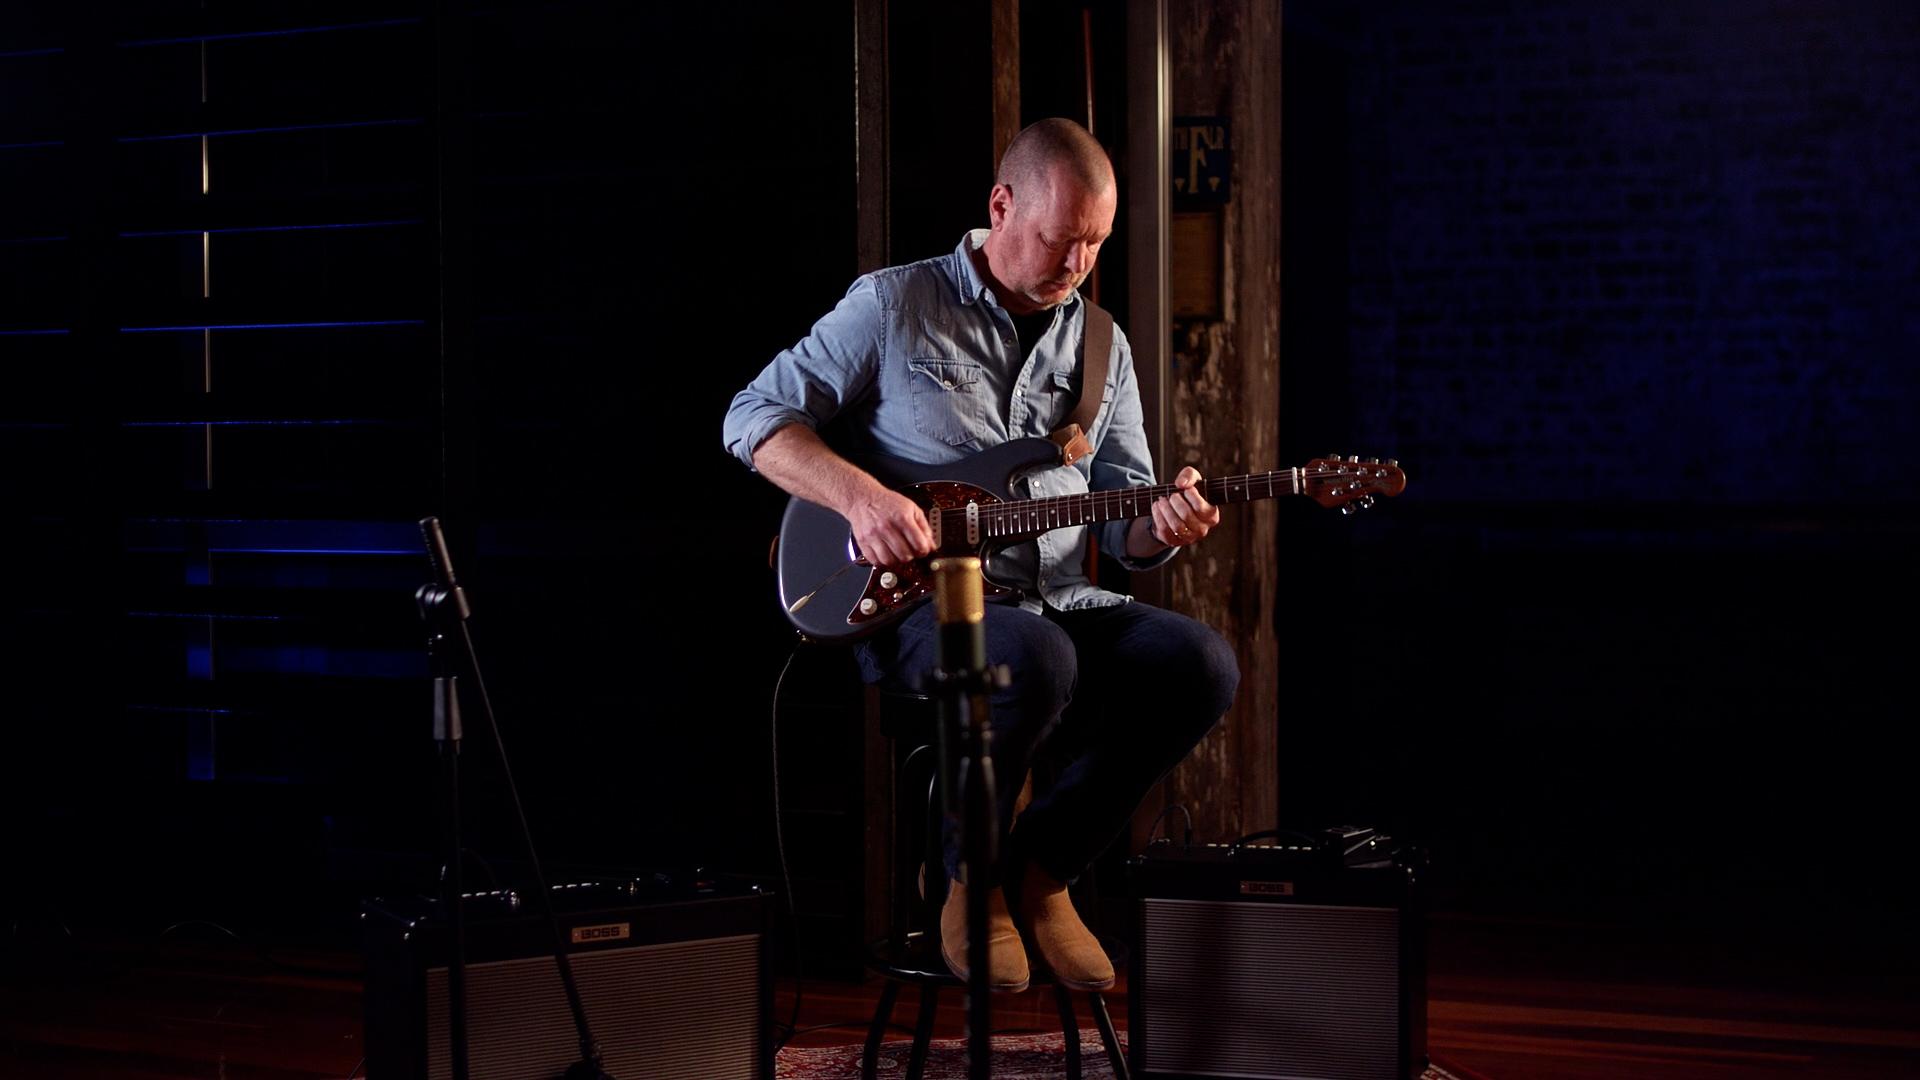 Nextone Artist/Stage Version.2 - Introduction by Brett Kingman